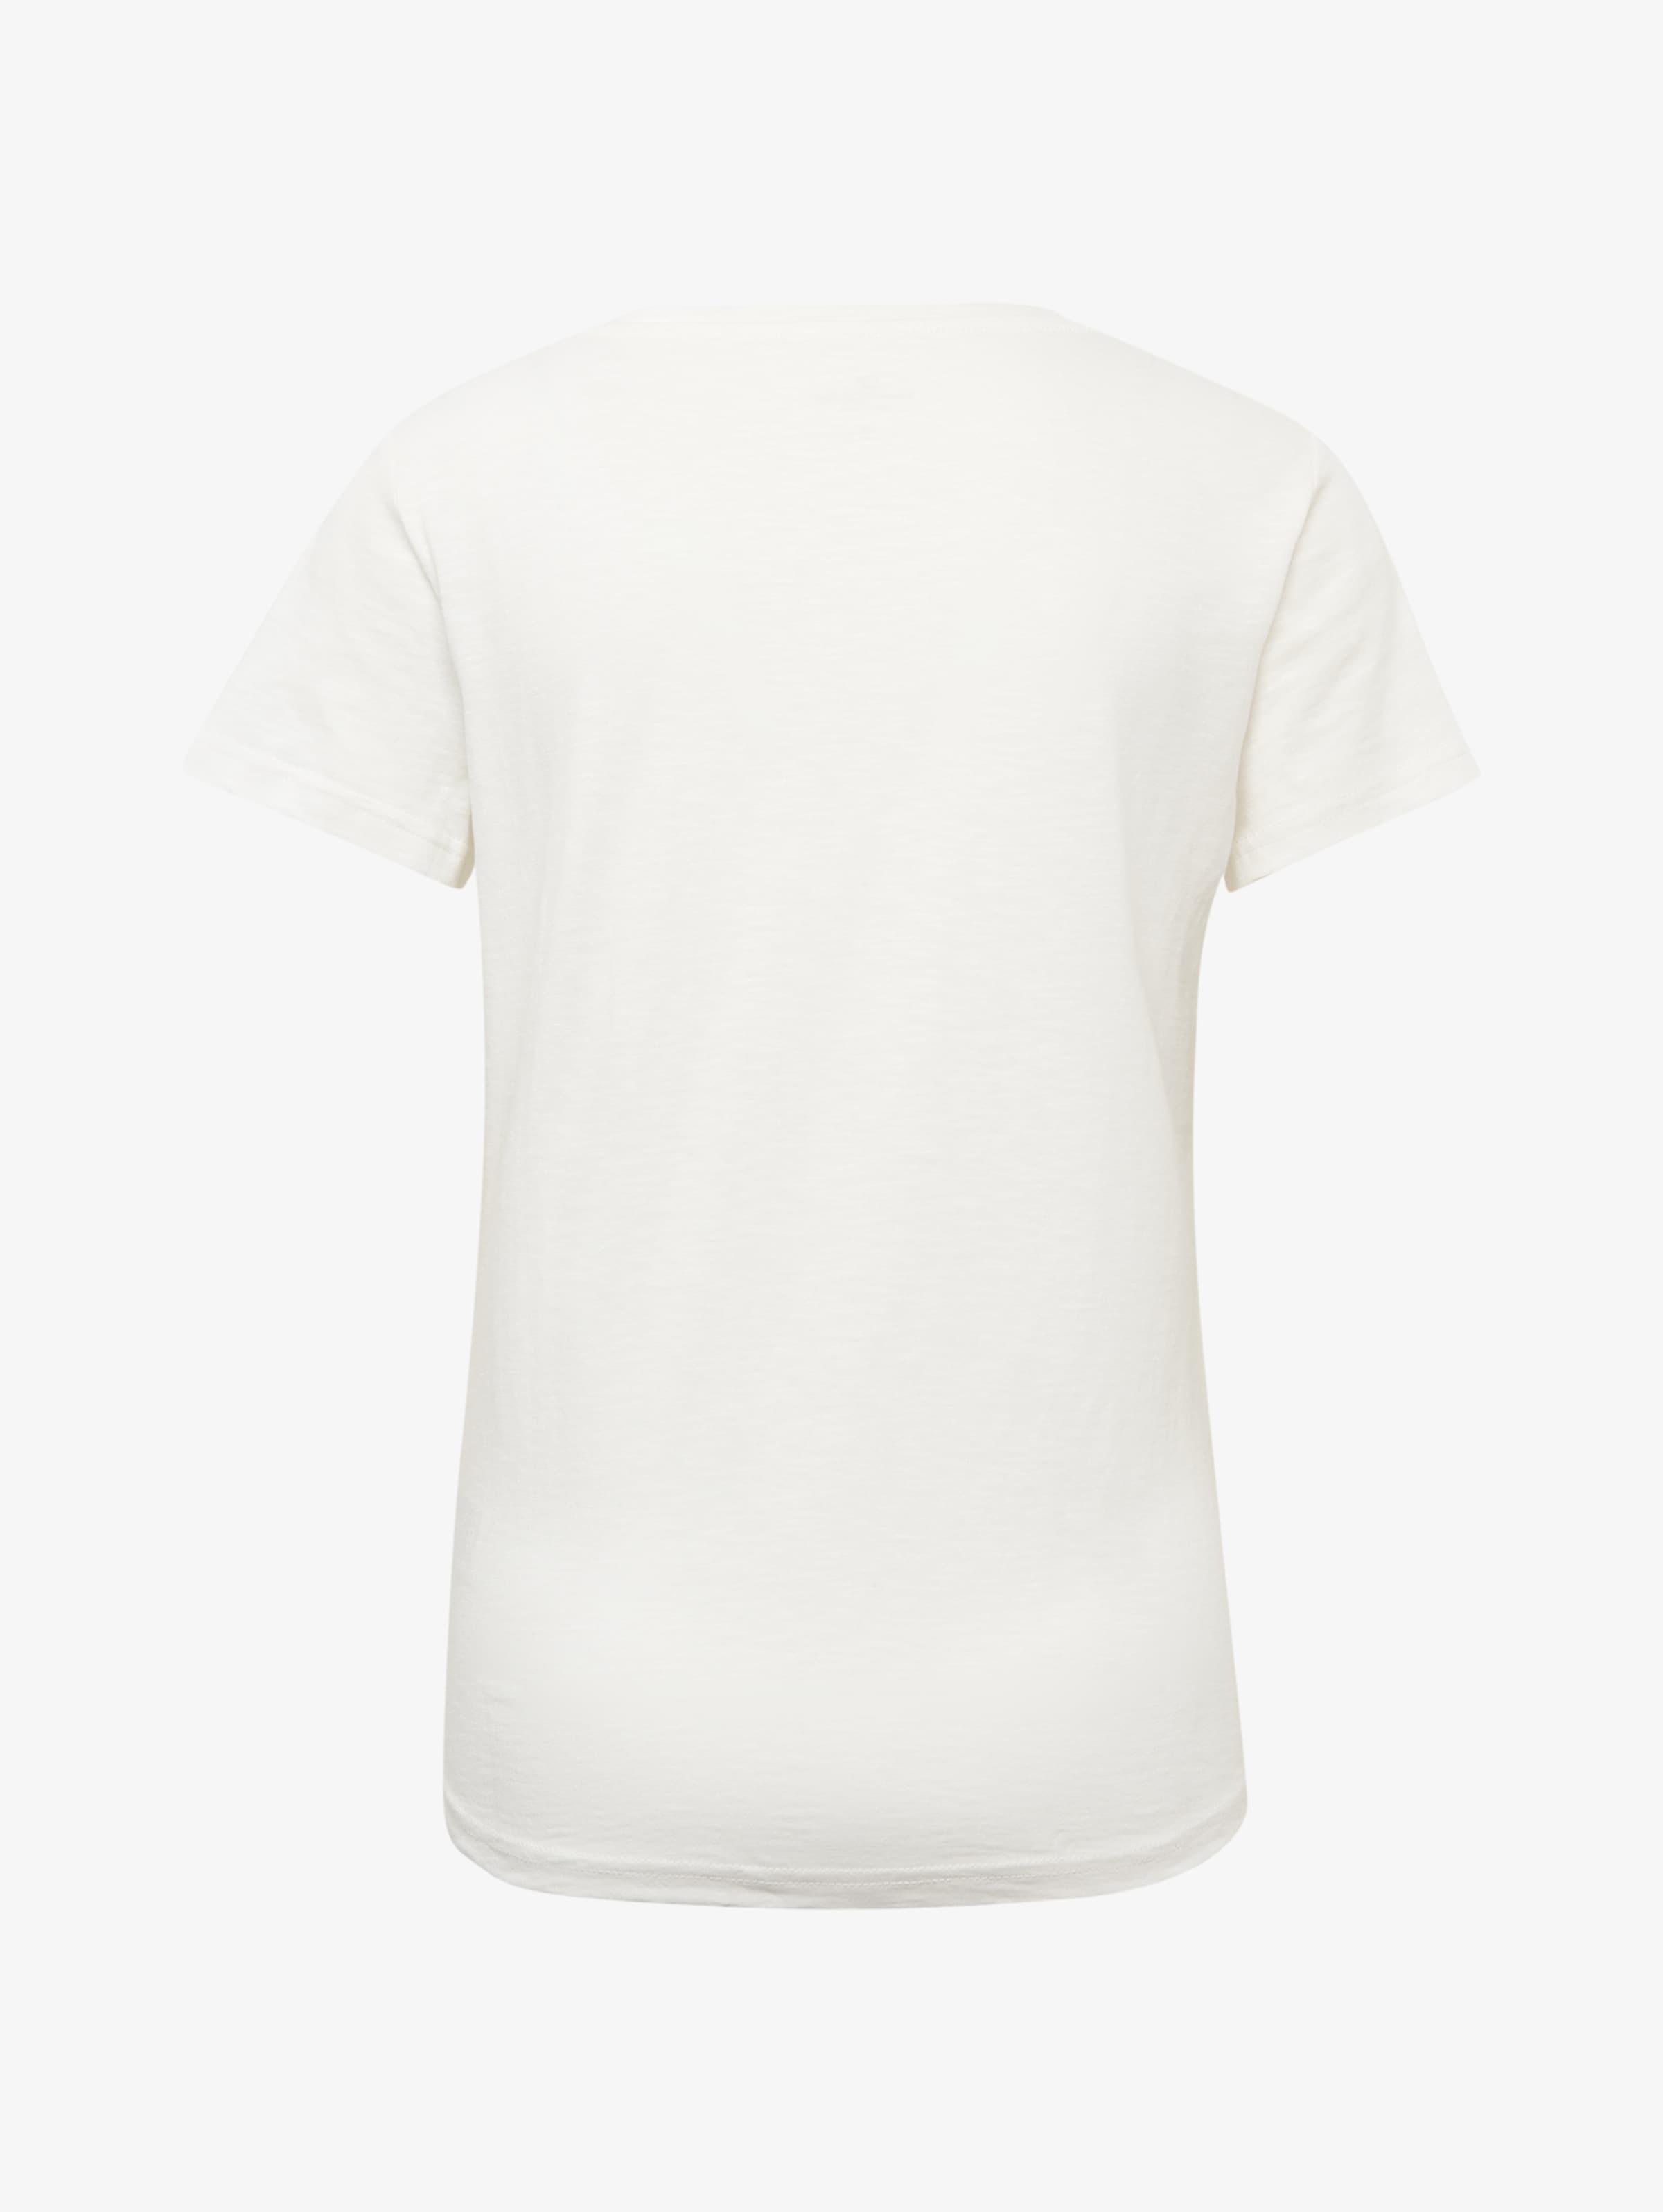 shirt In GelbWeiß Tom Tailor T xCWQrBoed